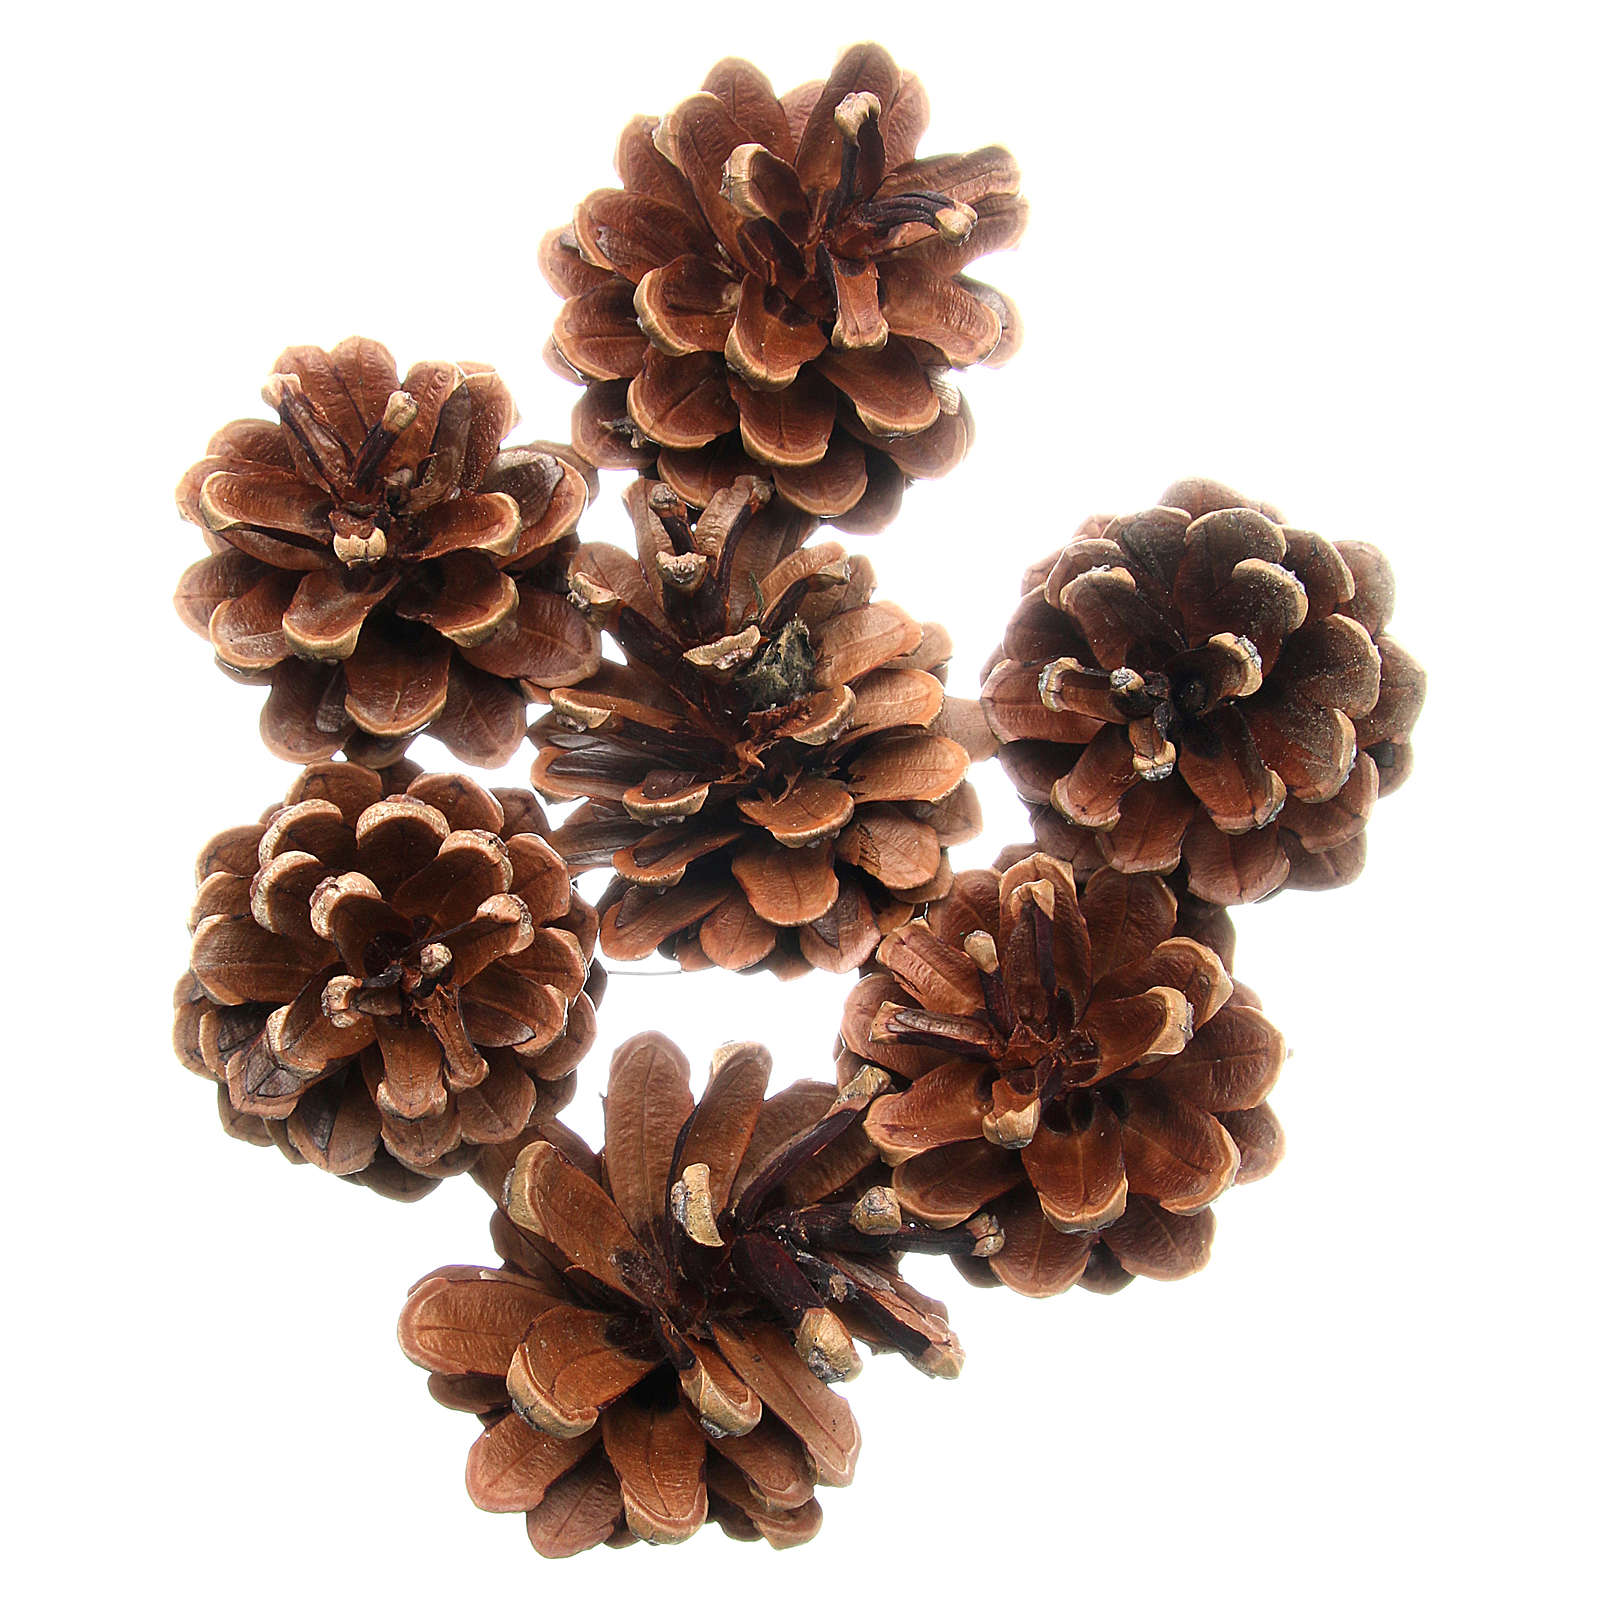 Pine cones, pack of 75grams 3